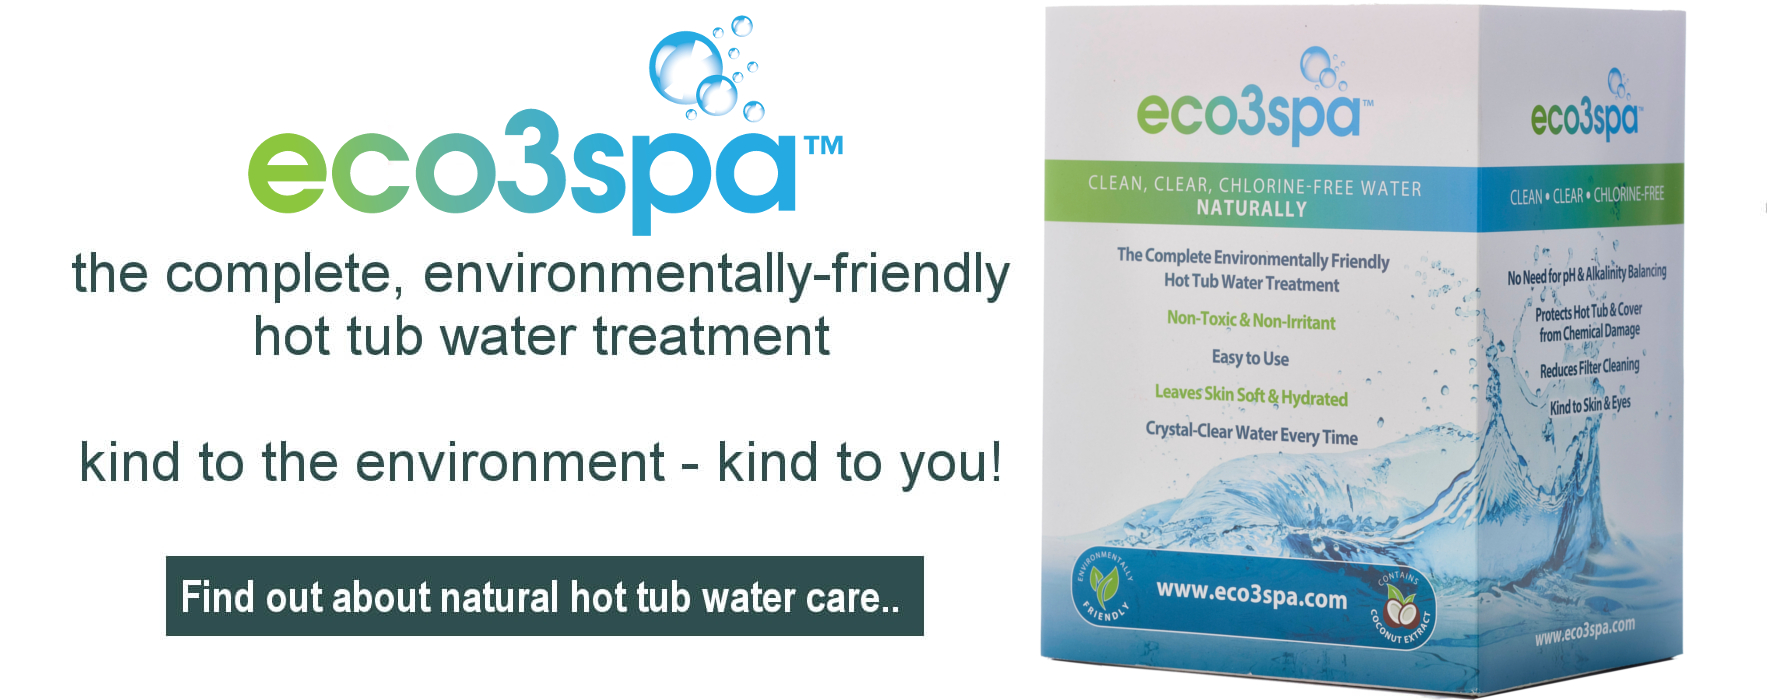 Environmentally friendly hot tub water treatment